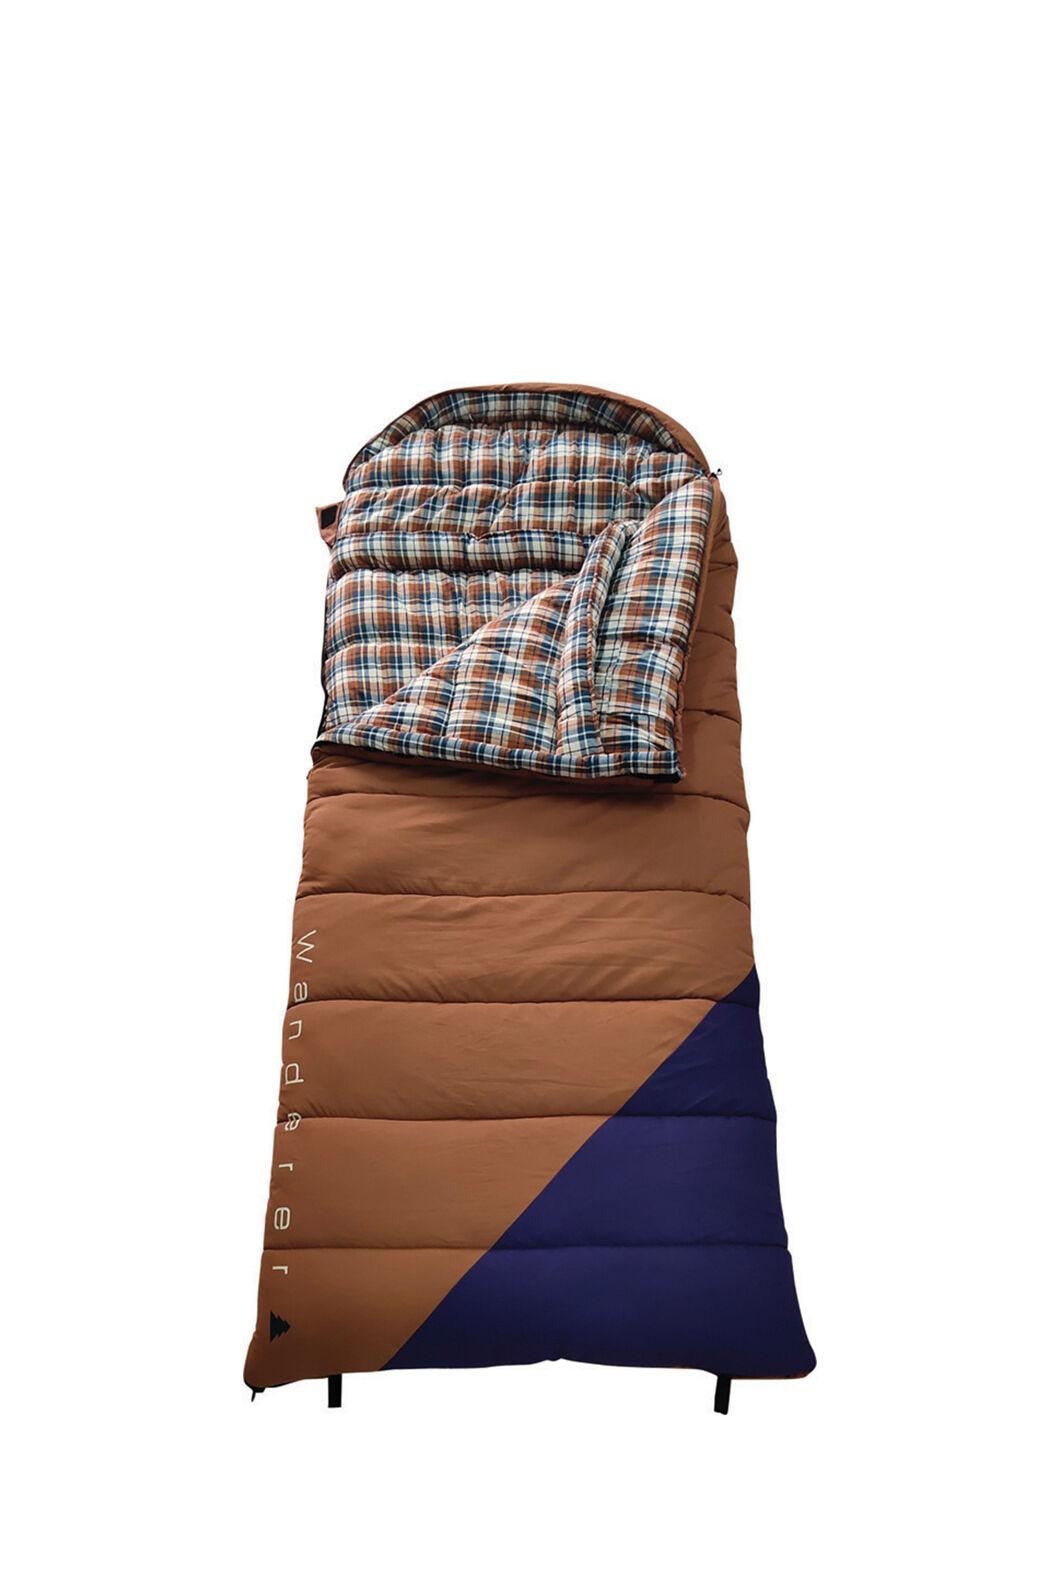 Wanderer Grand Yarra Cotton Hooded Sleeping Bag, Tan/Navy, hi-res